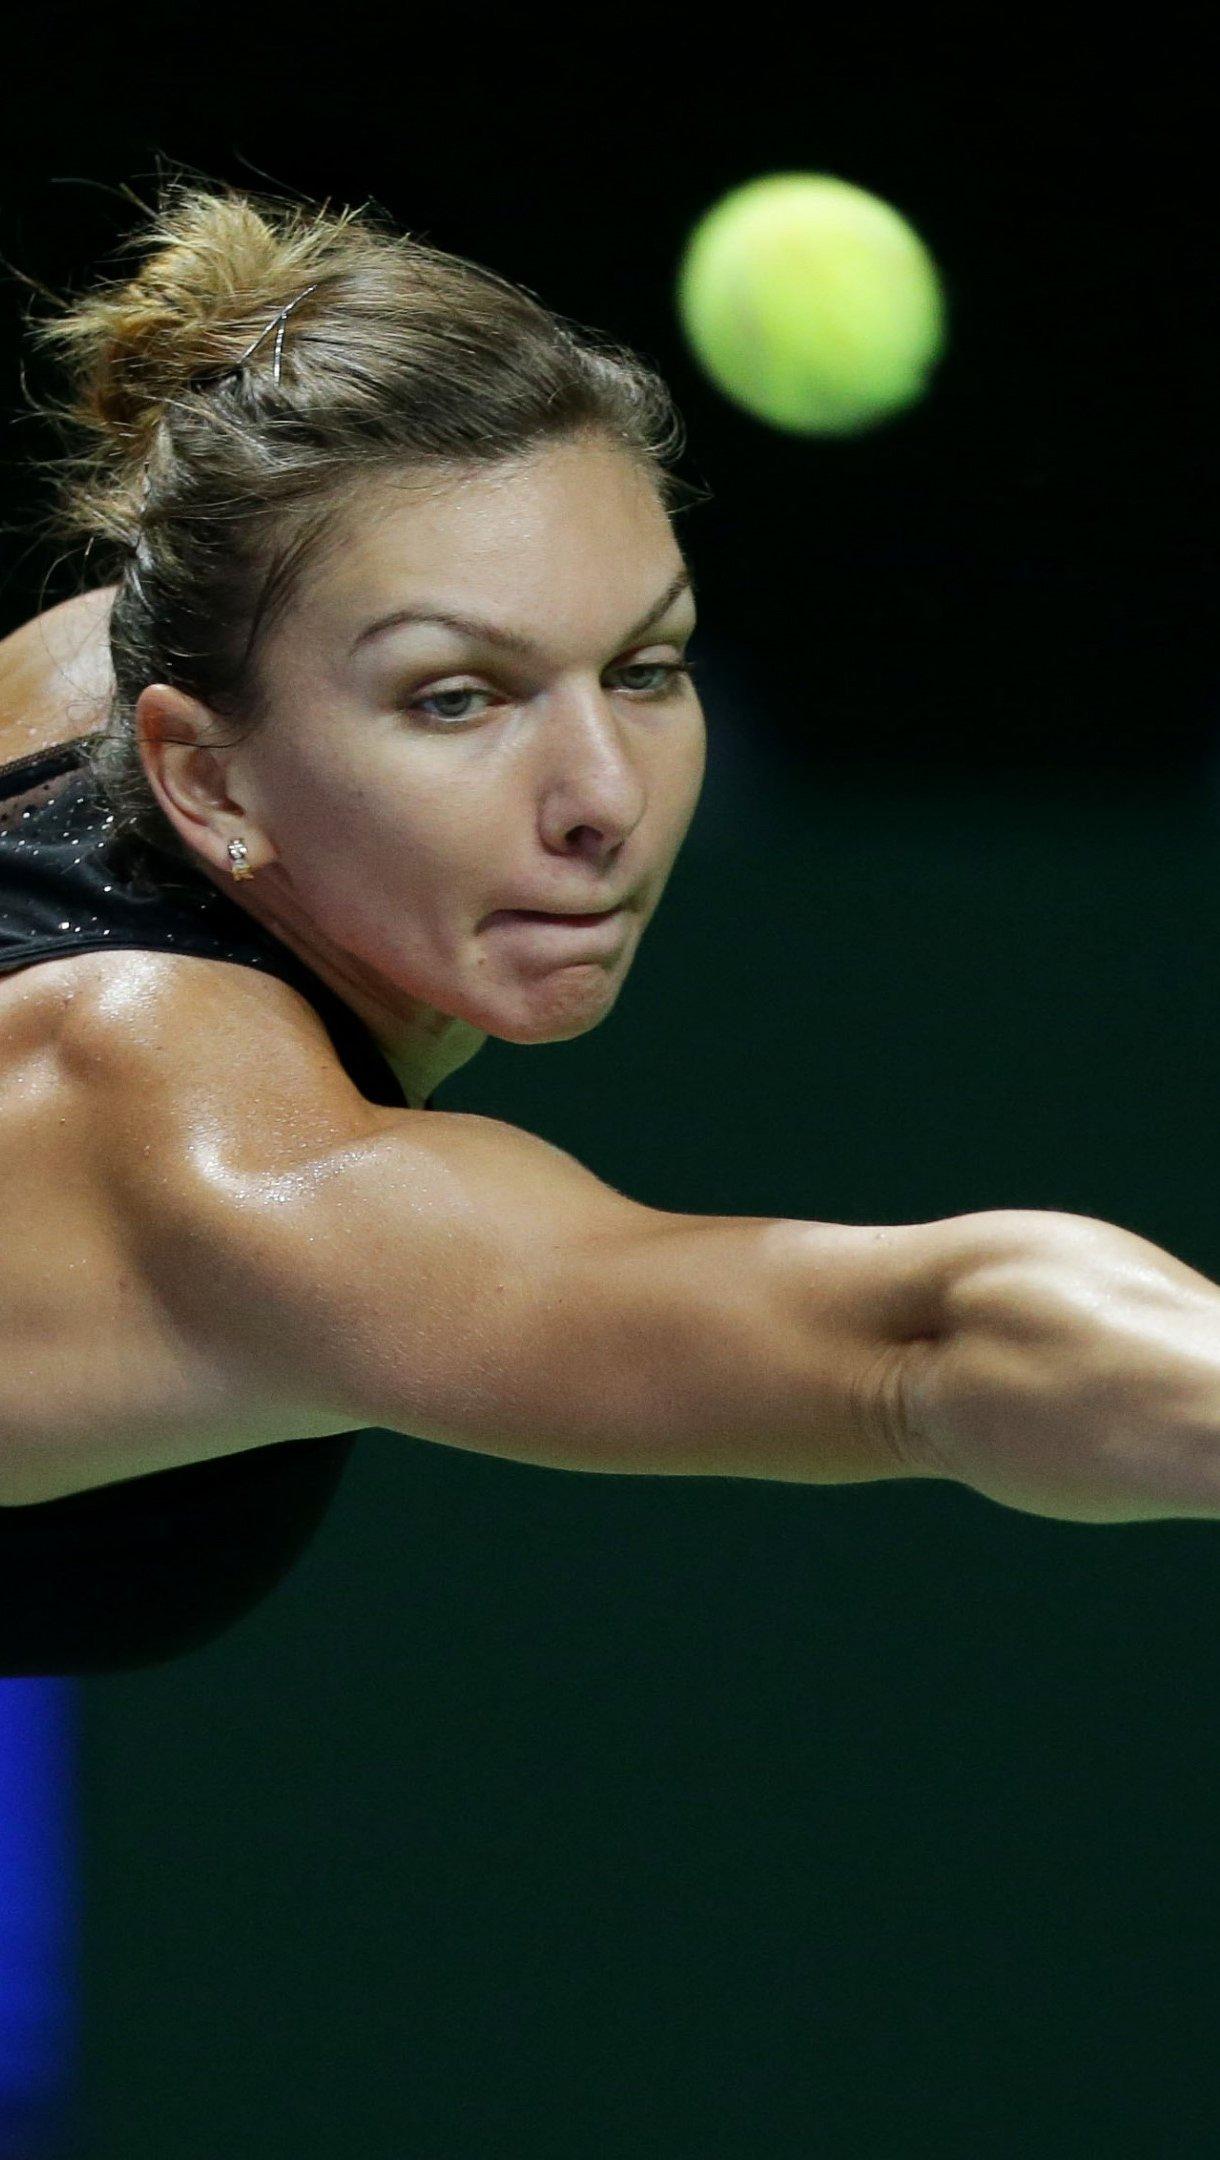 Wallpaper Simona Halep playing tennis Vertical